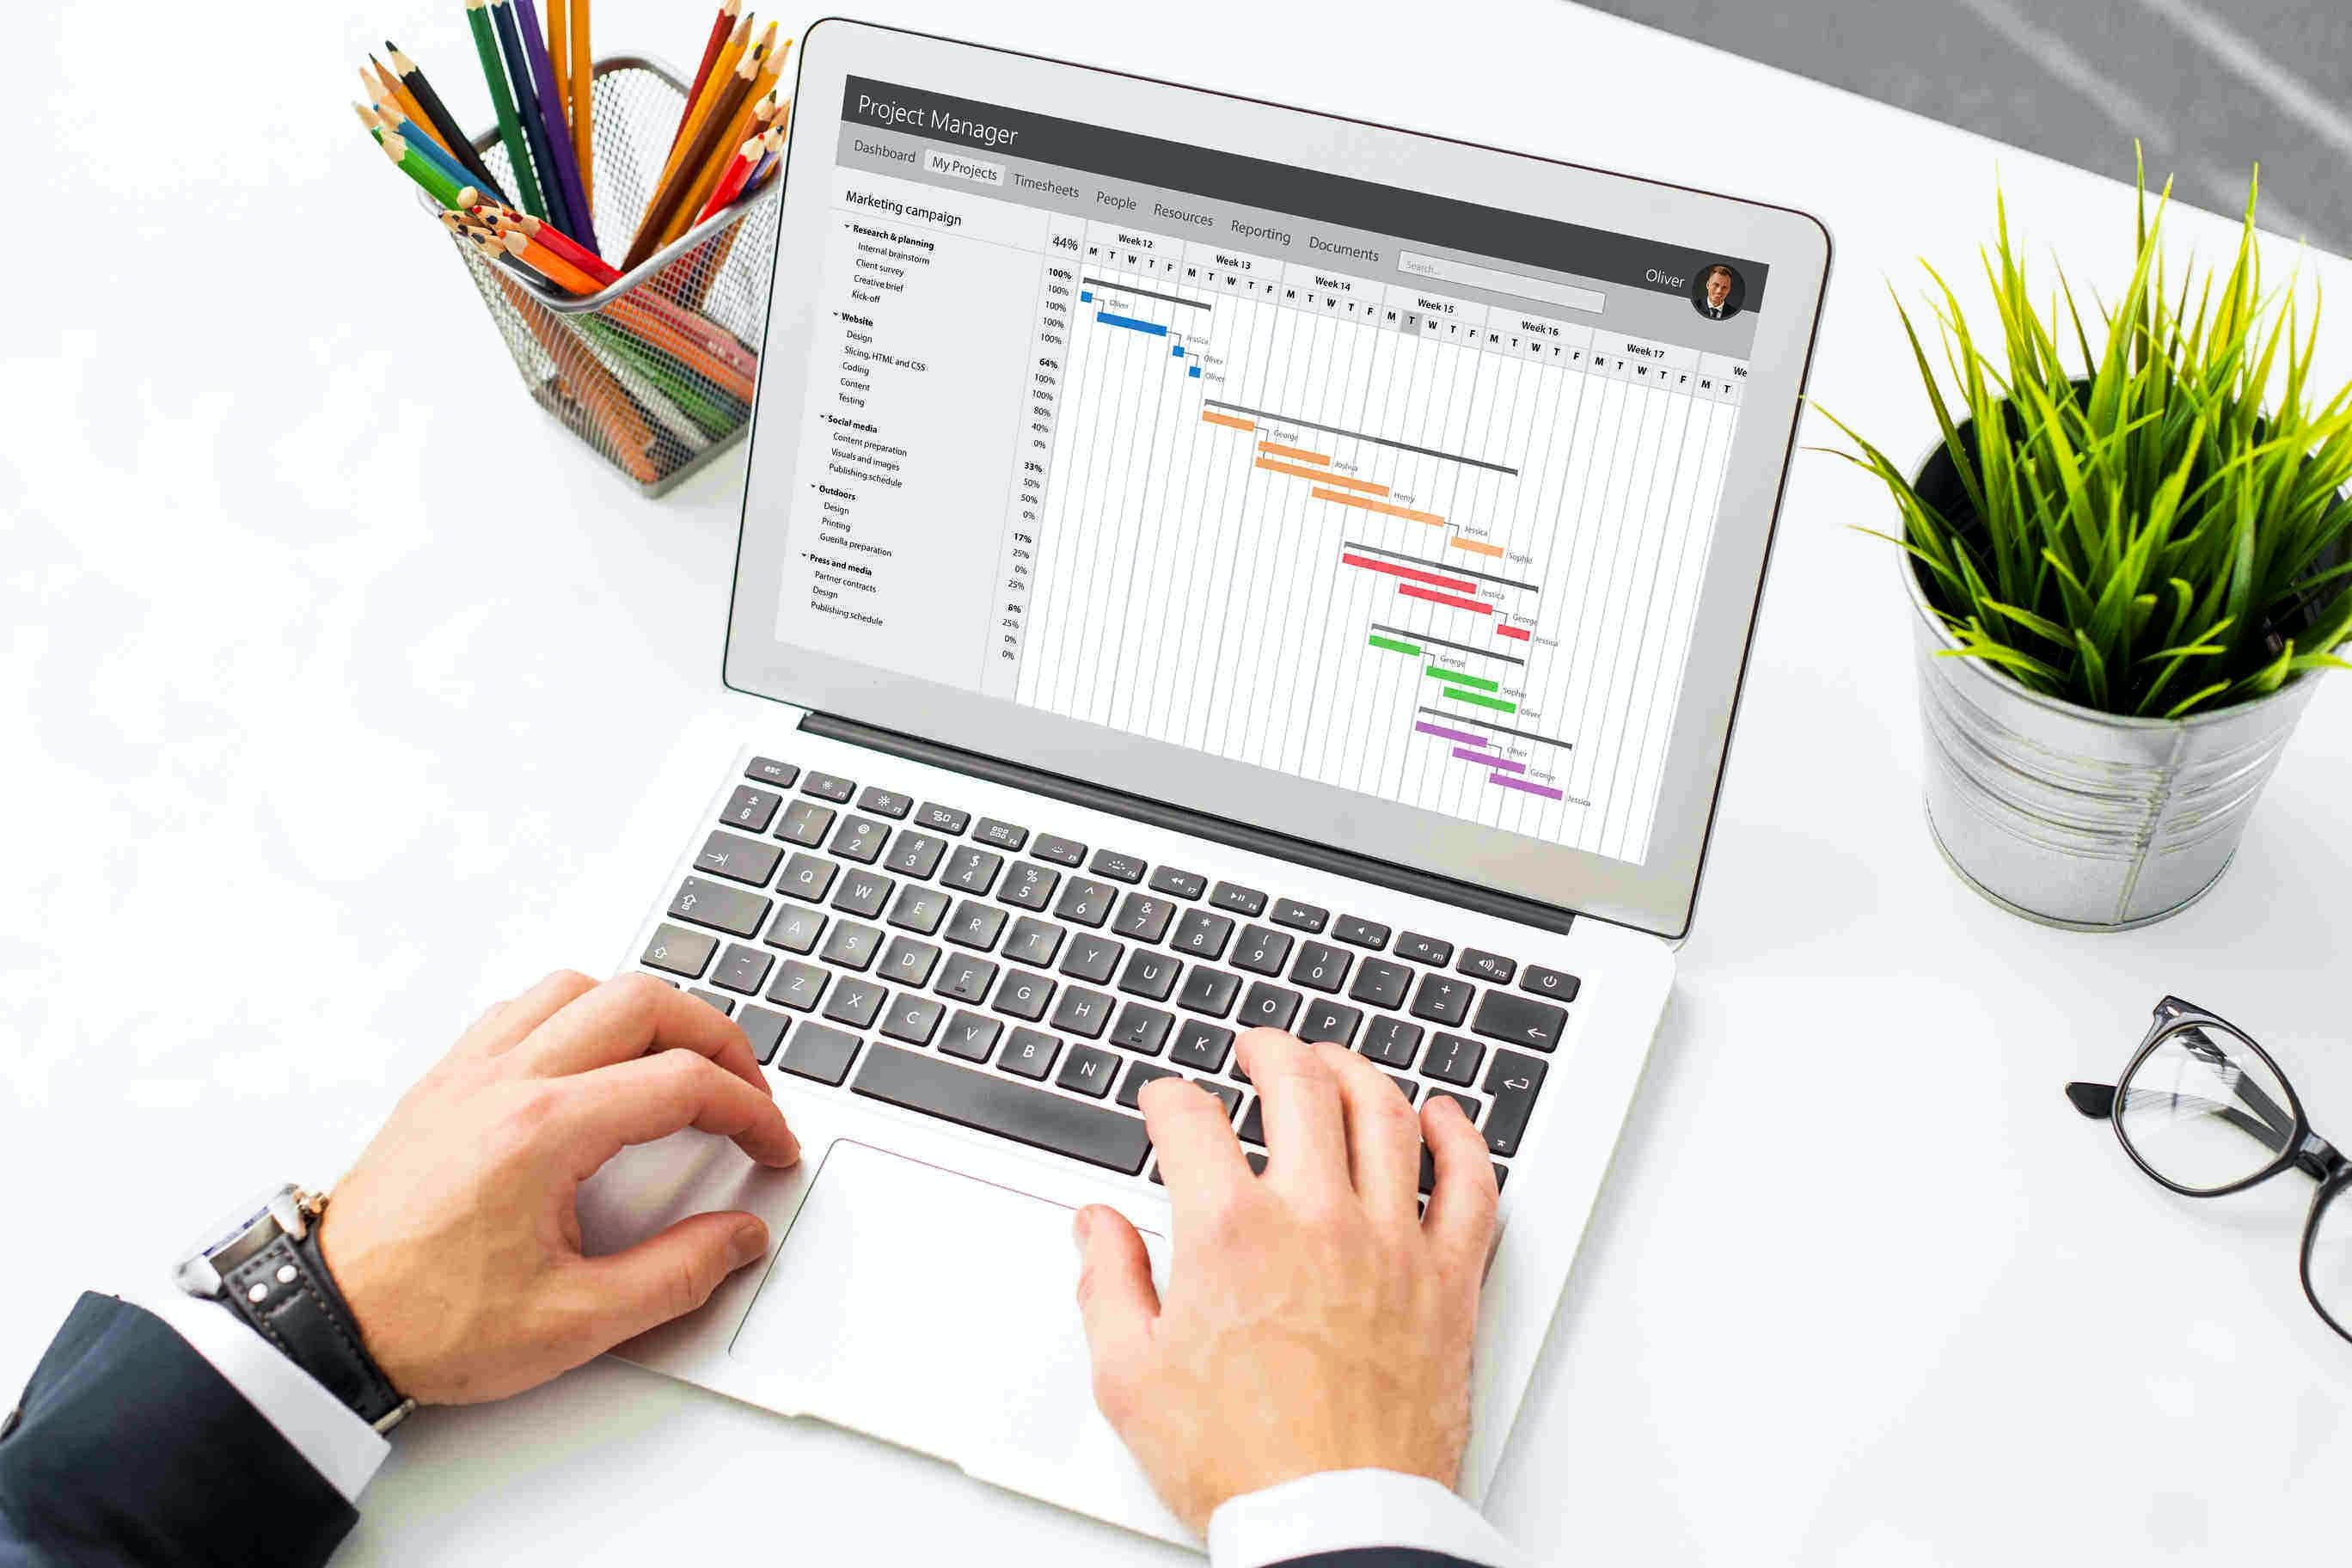 Gantt-Chart-Tools: das Planungsinstrument im Projektmanagement